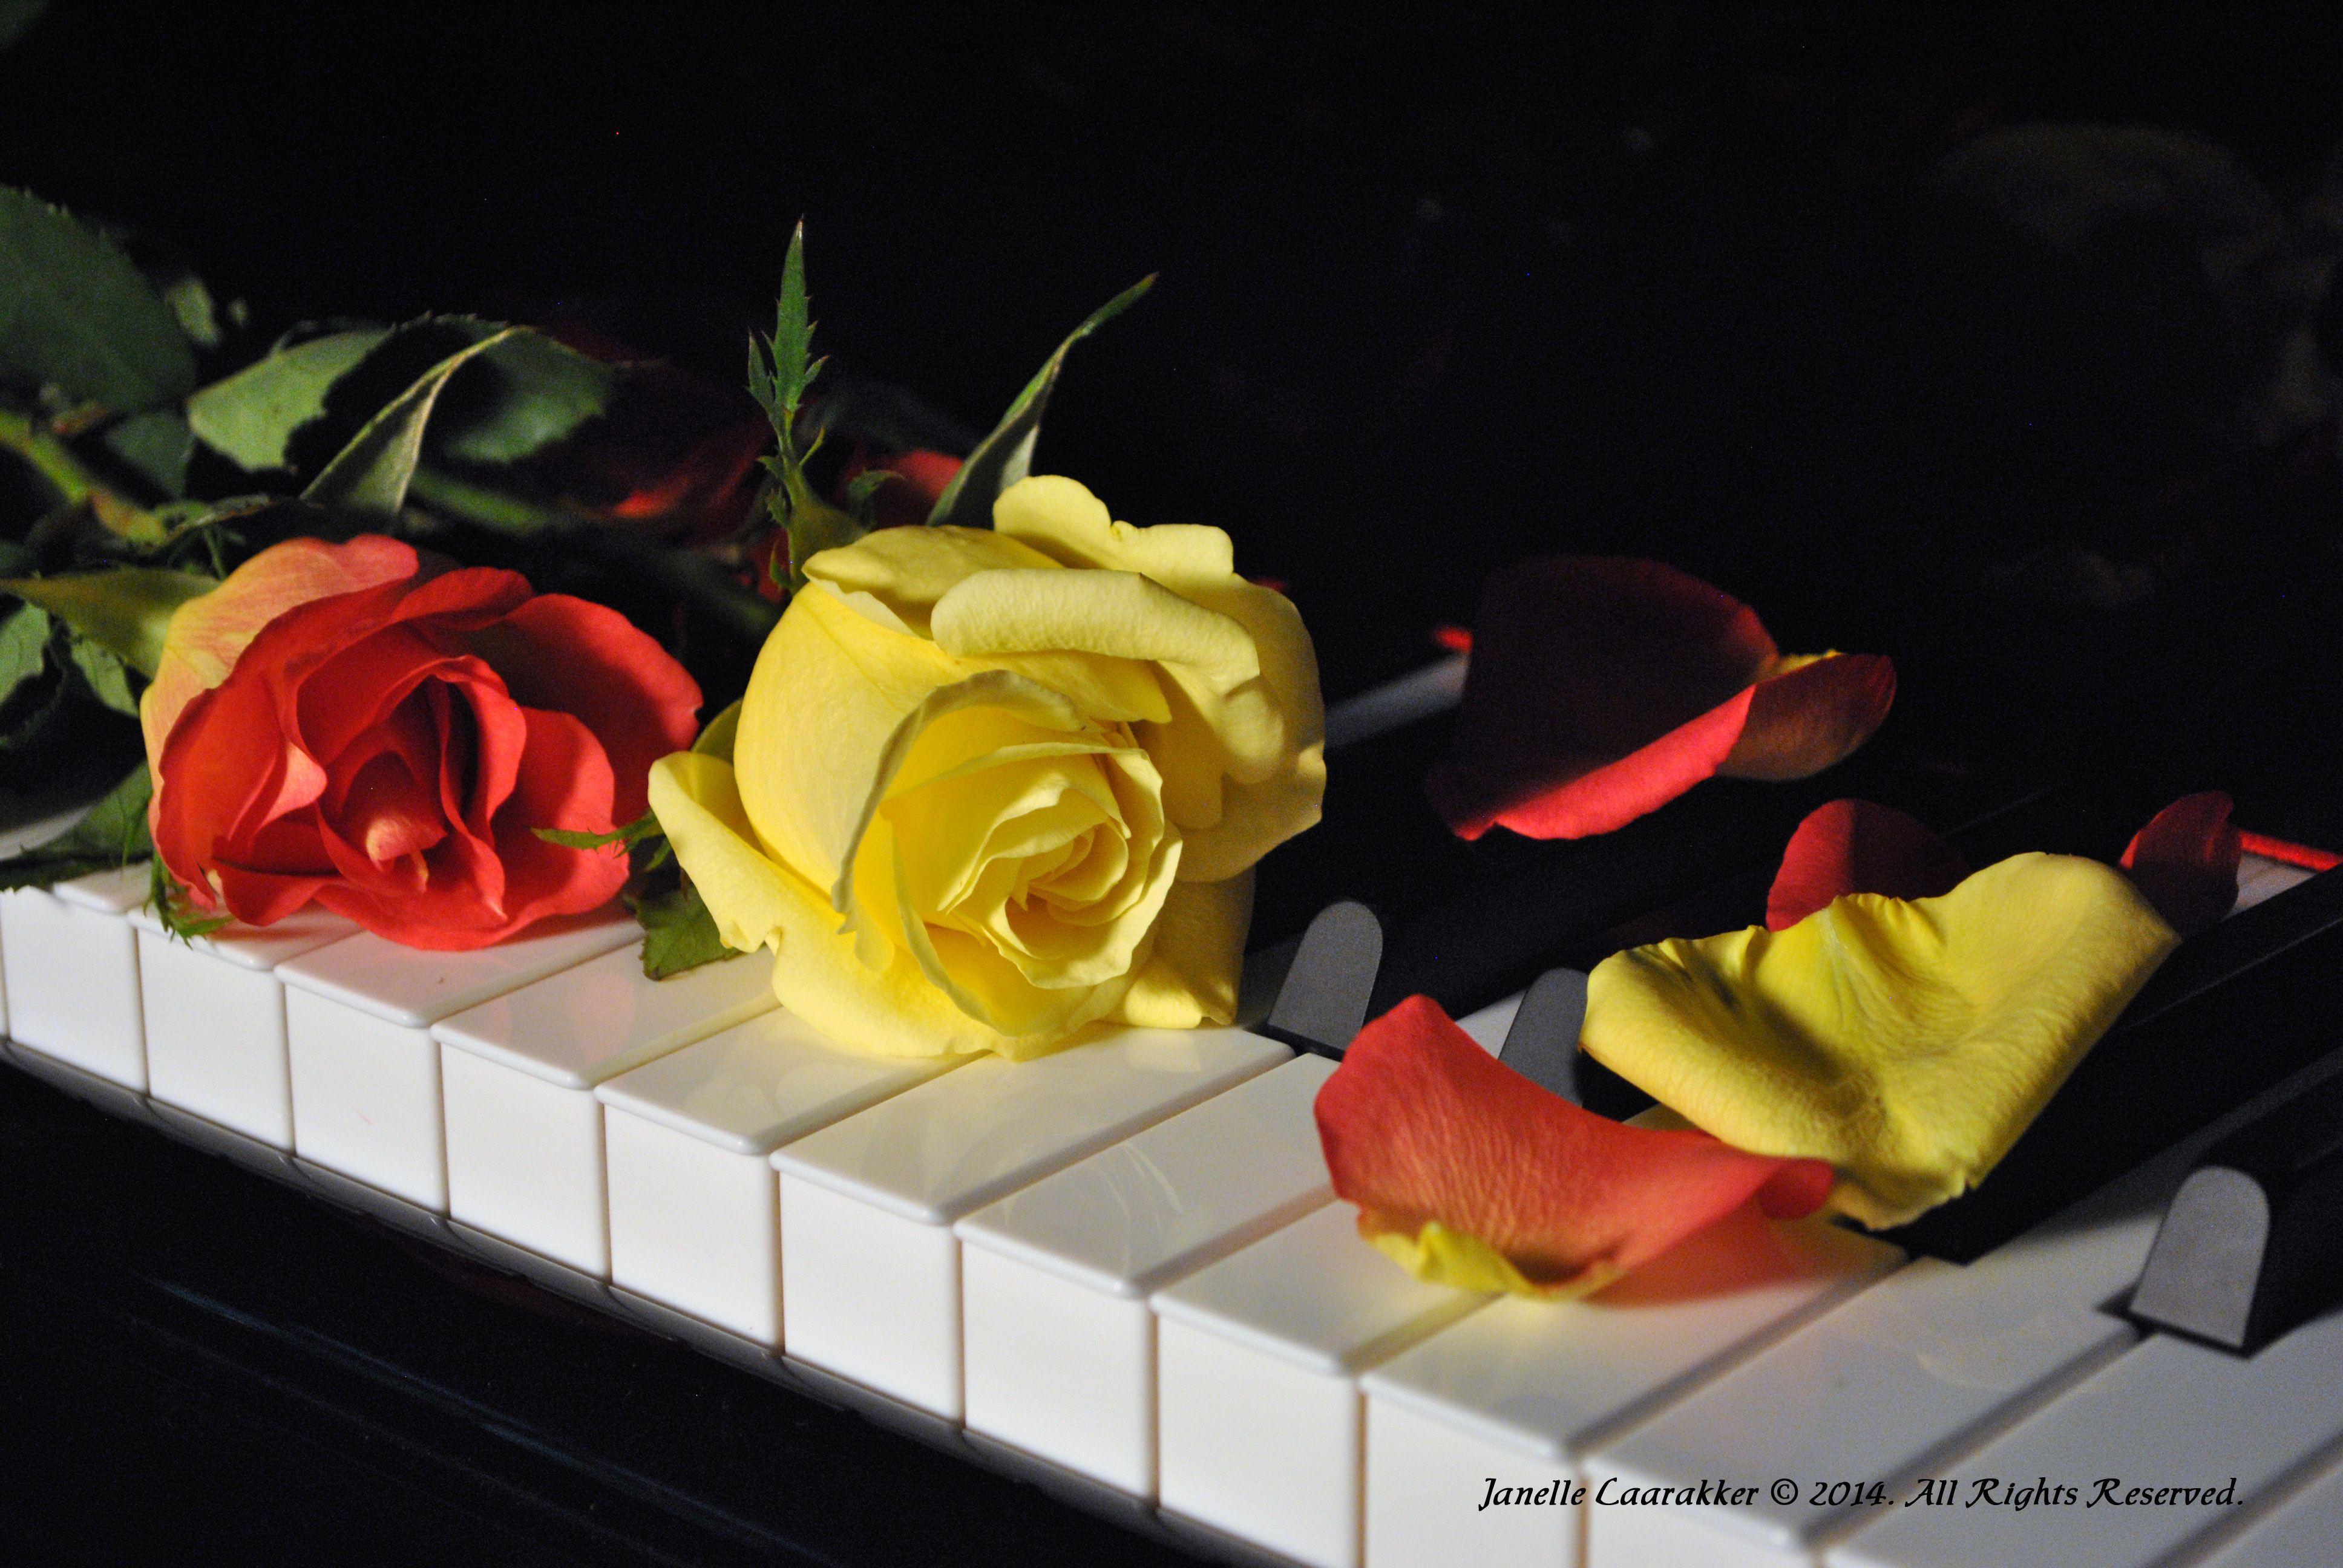 Piano Keys & Roses - an original photograph by Janelle Laarakker.